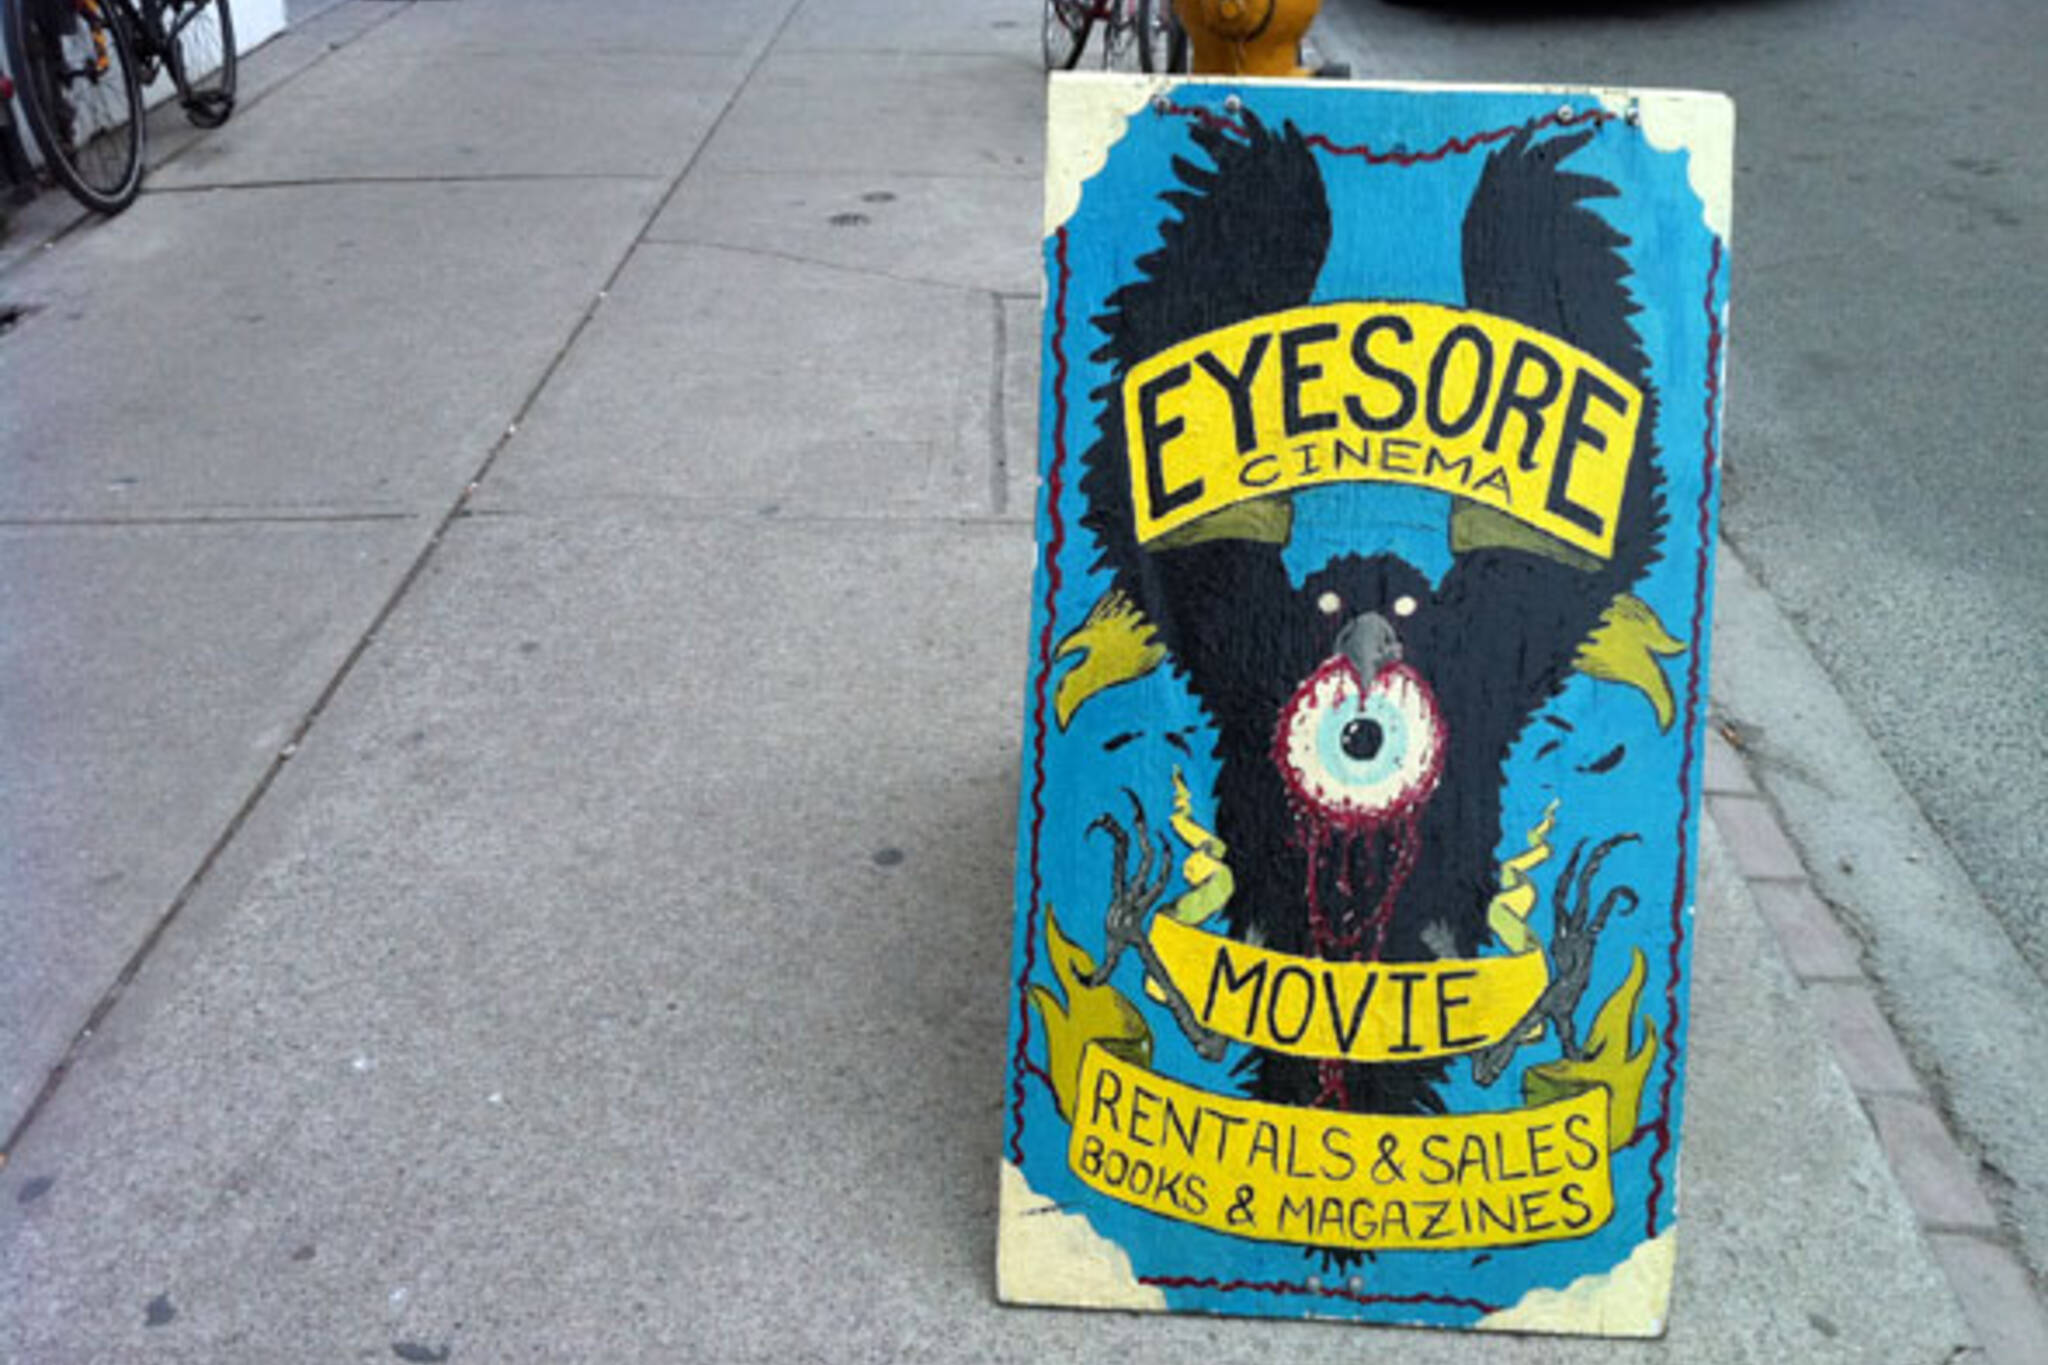 2011515-eyesore-cinema.jpg